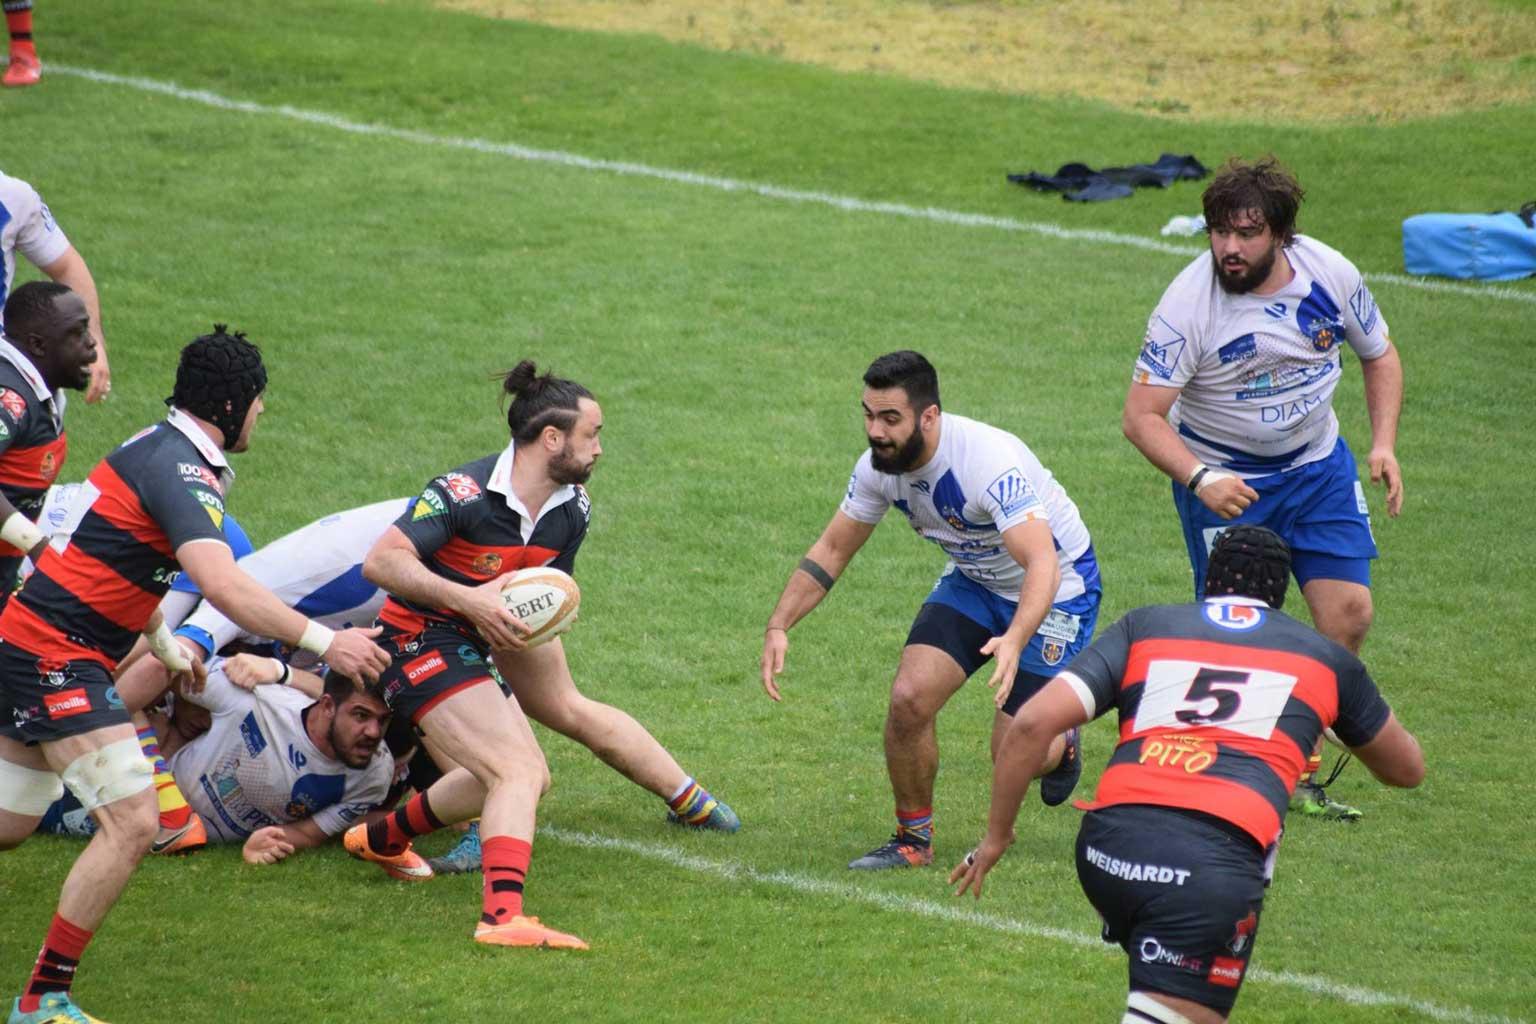 © 2019 Maeva Franco - Équipe 1 - S.C. Graulhet vs Céret Sportif